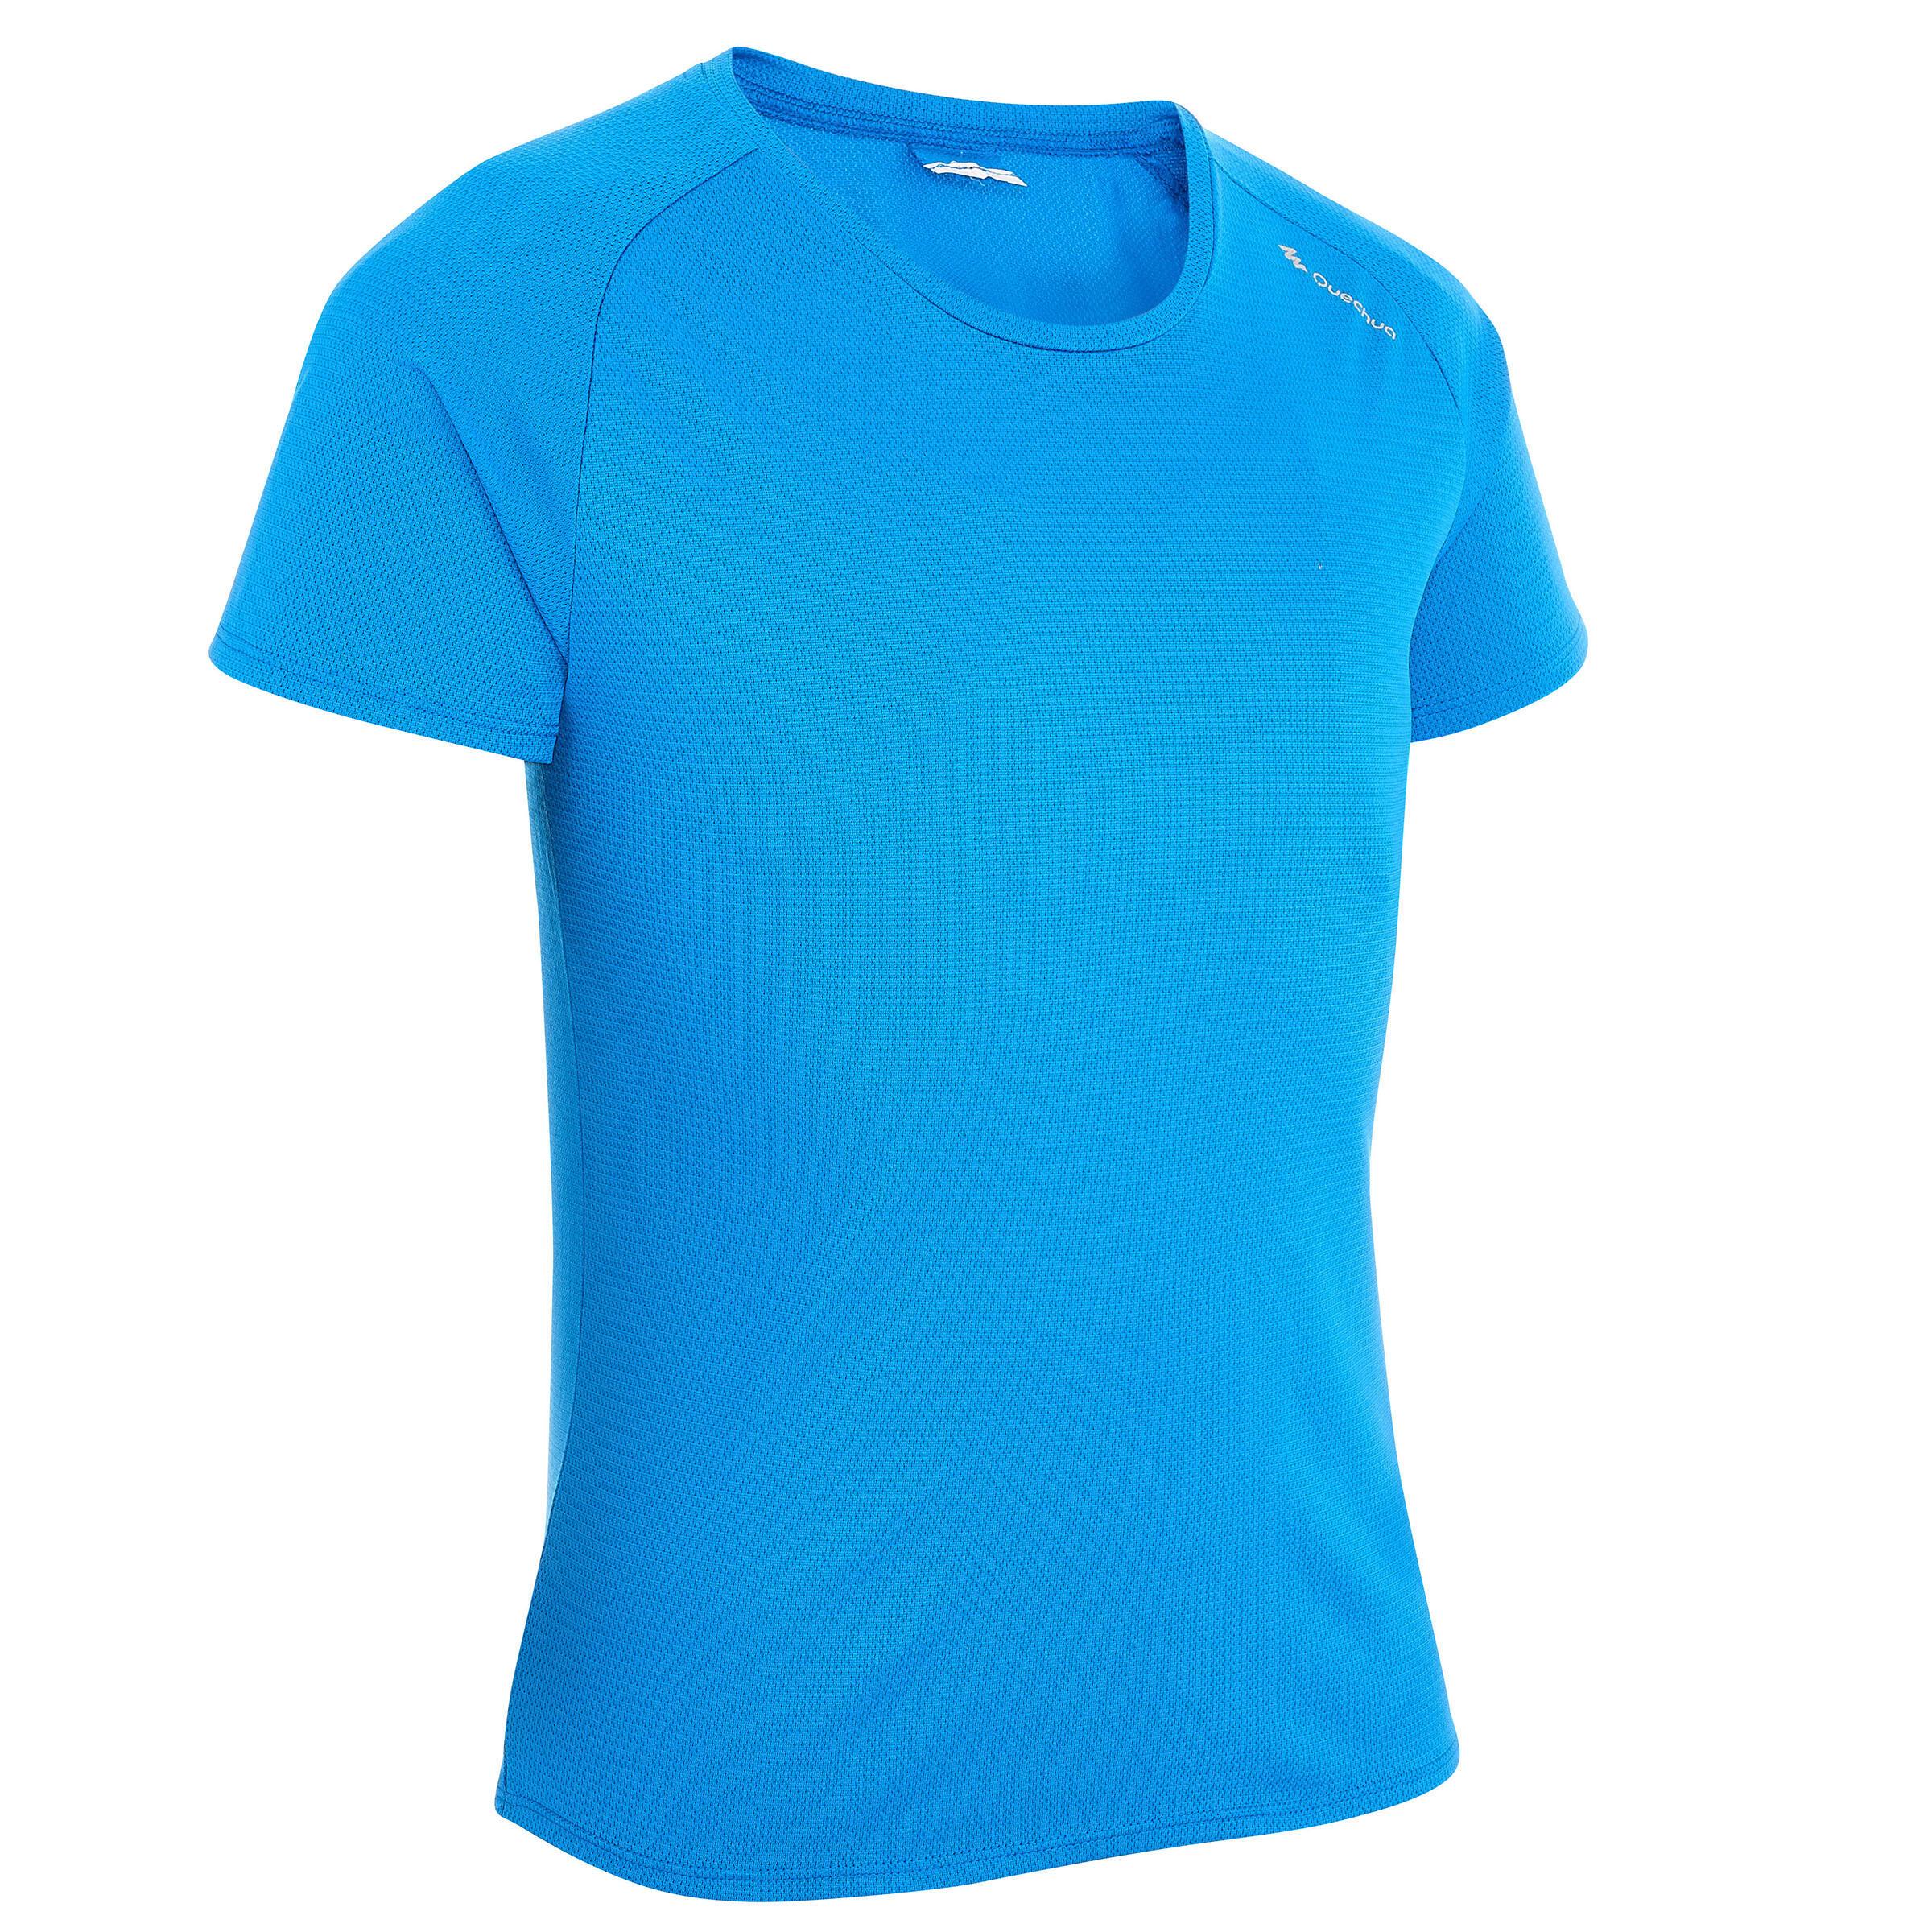 Playera de senderismo niño Hike 100 azul